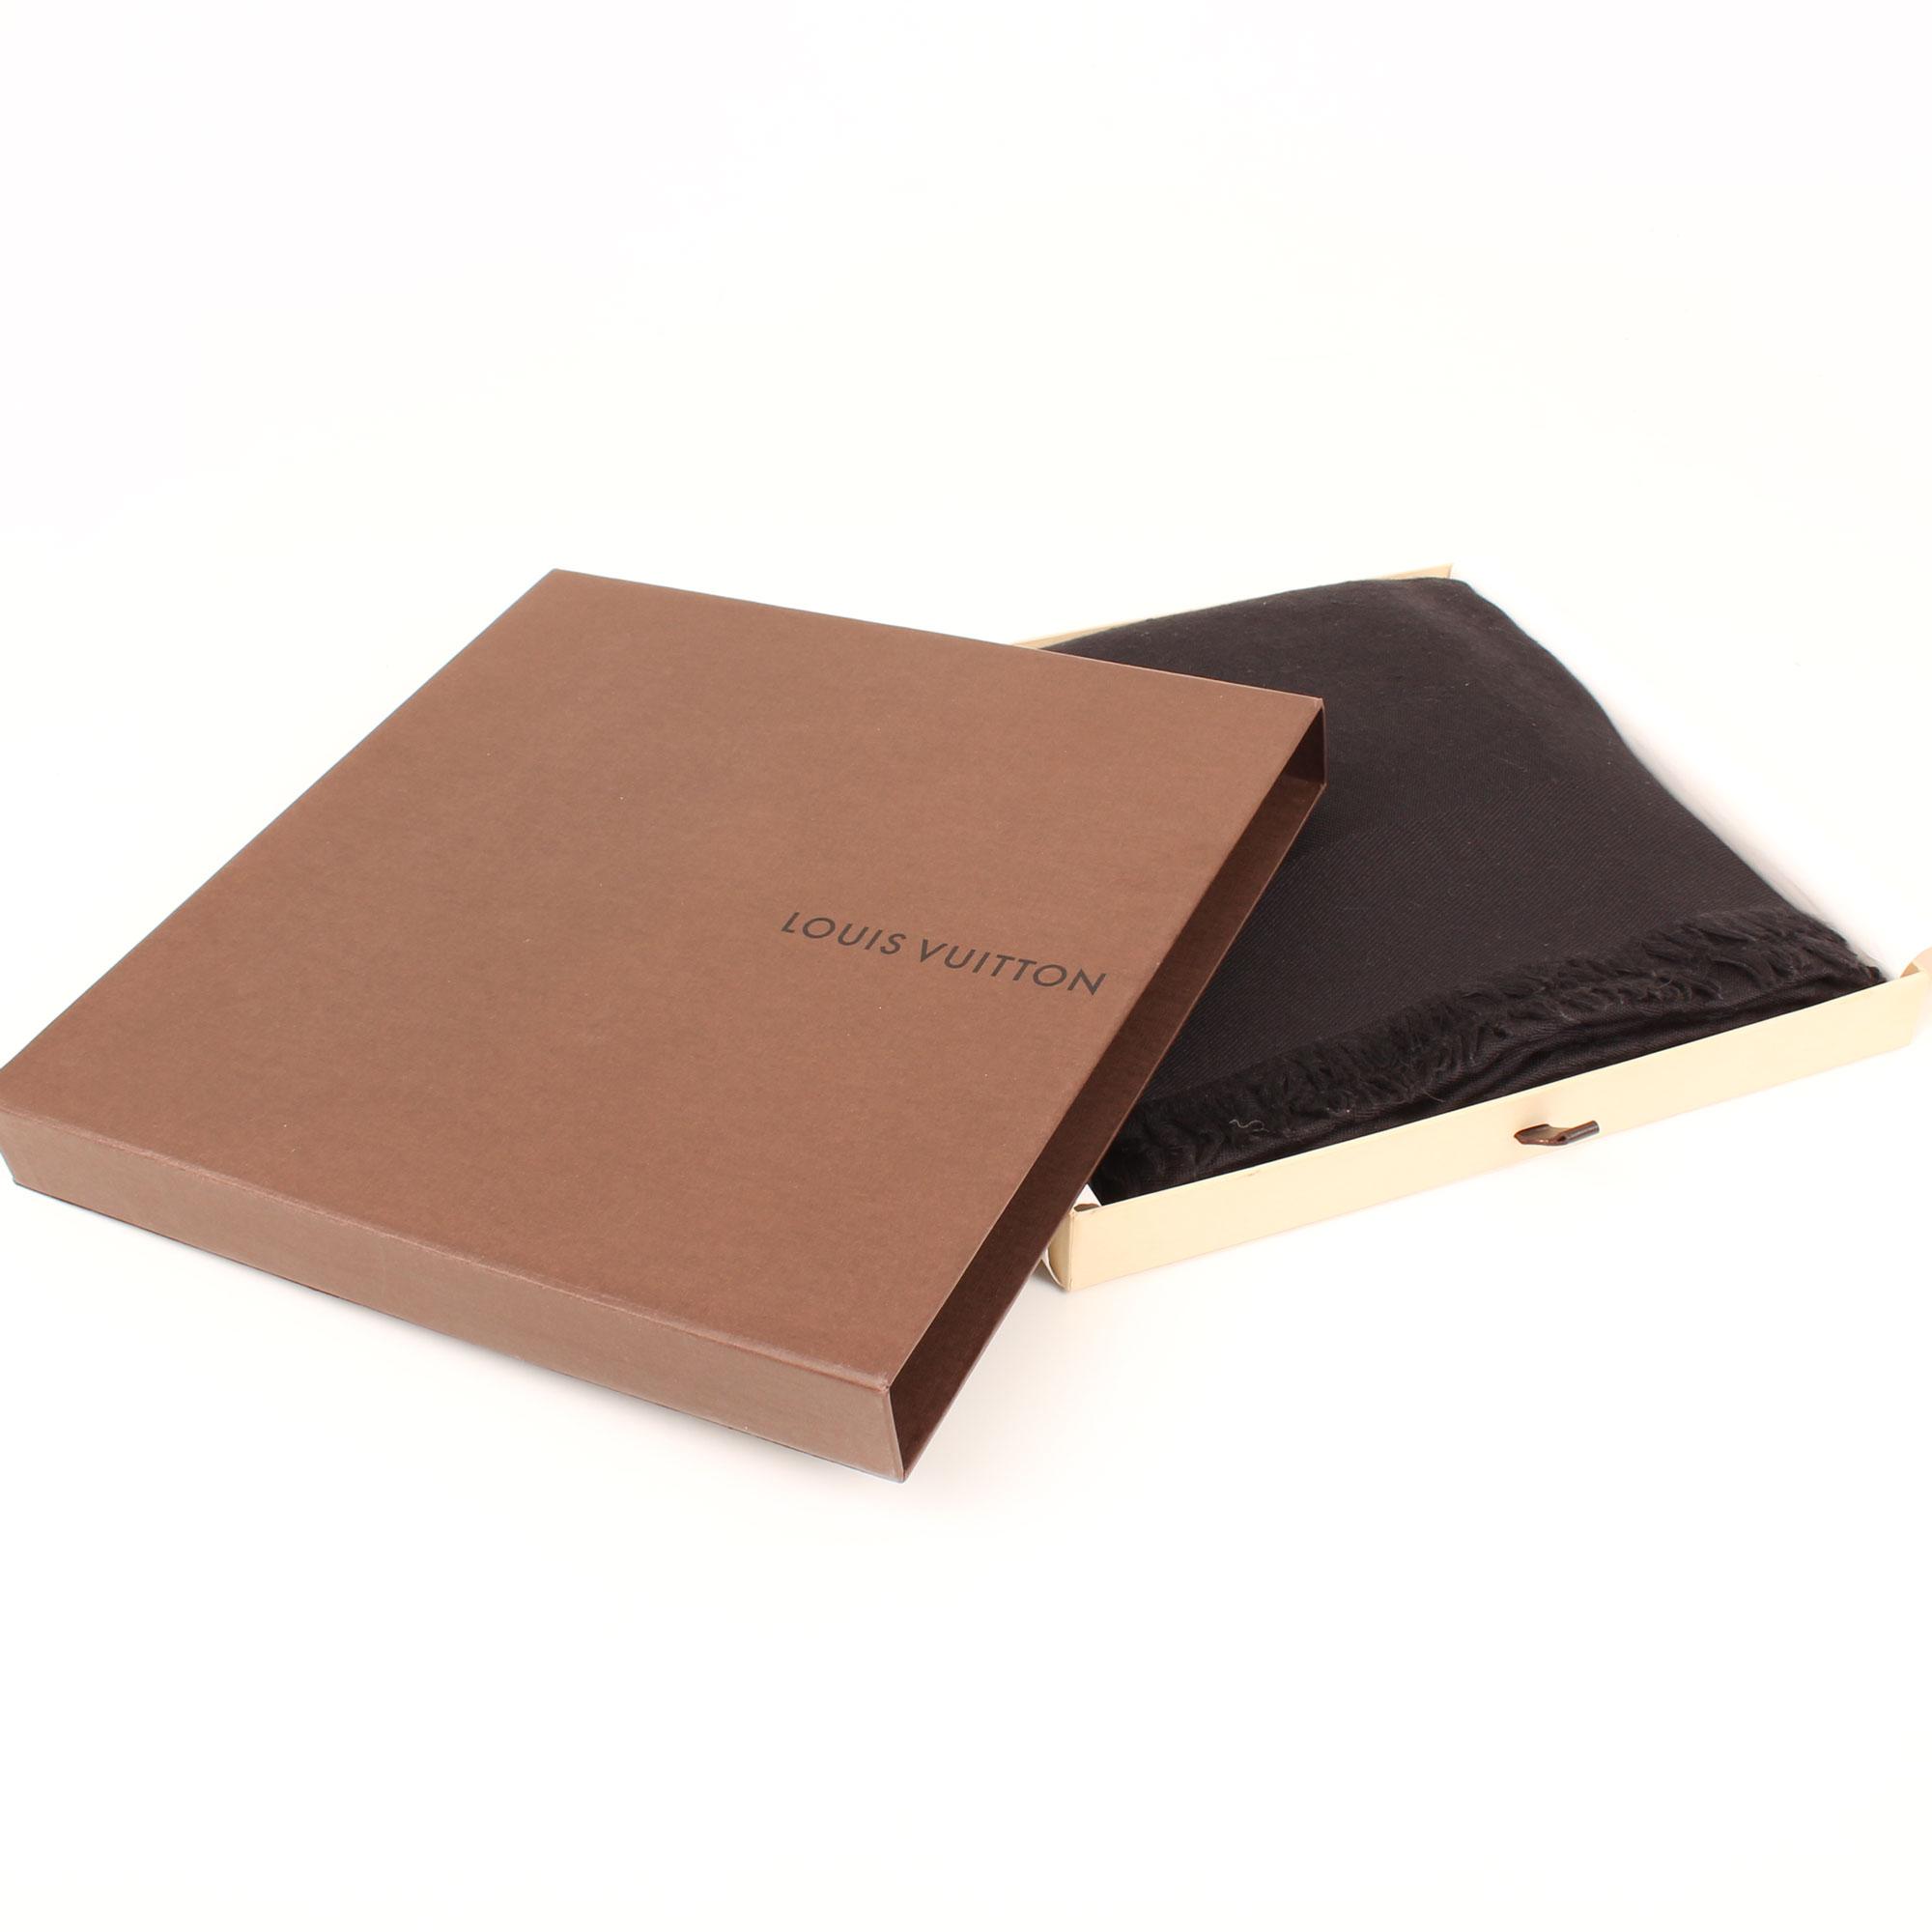 shawl-louis-vuitton-monogram-black-box